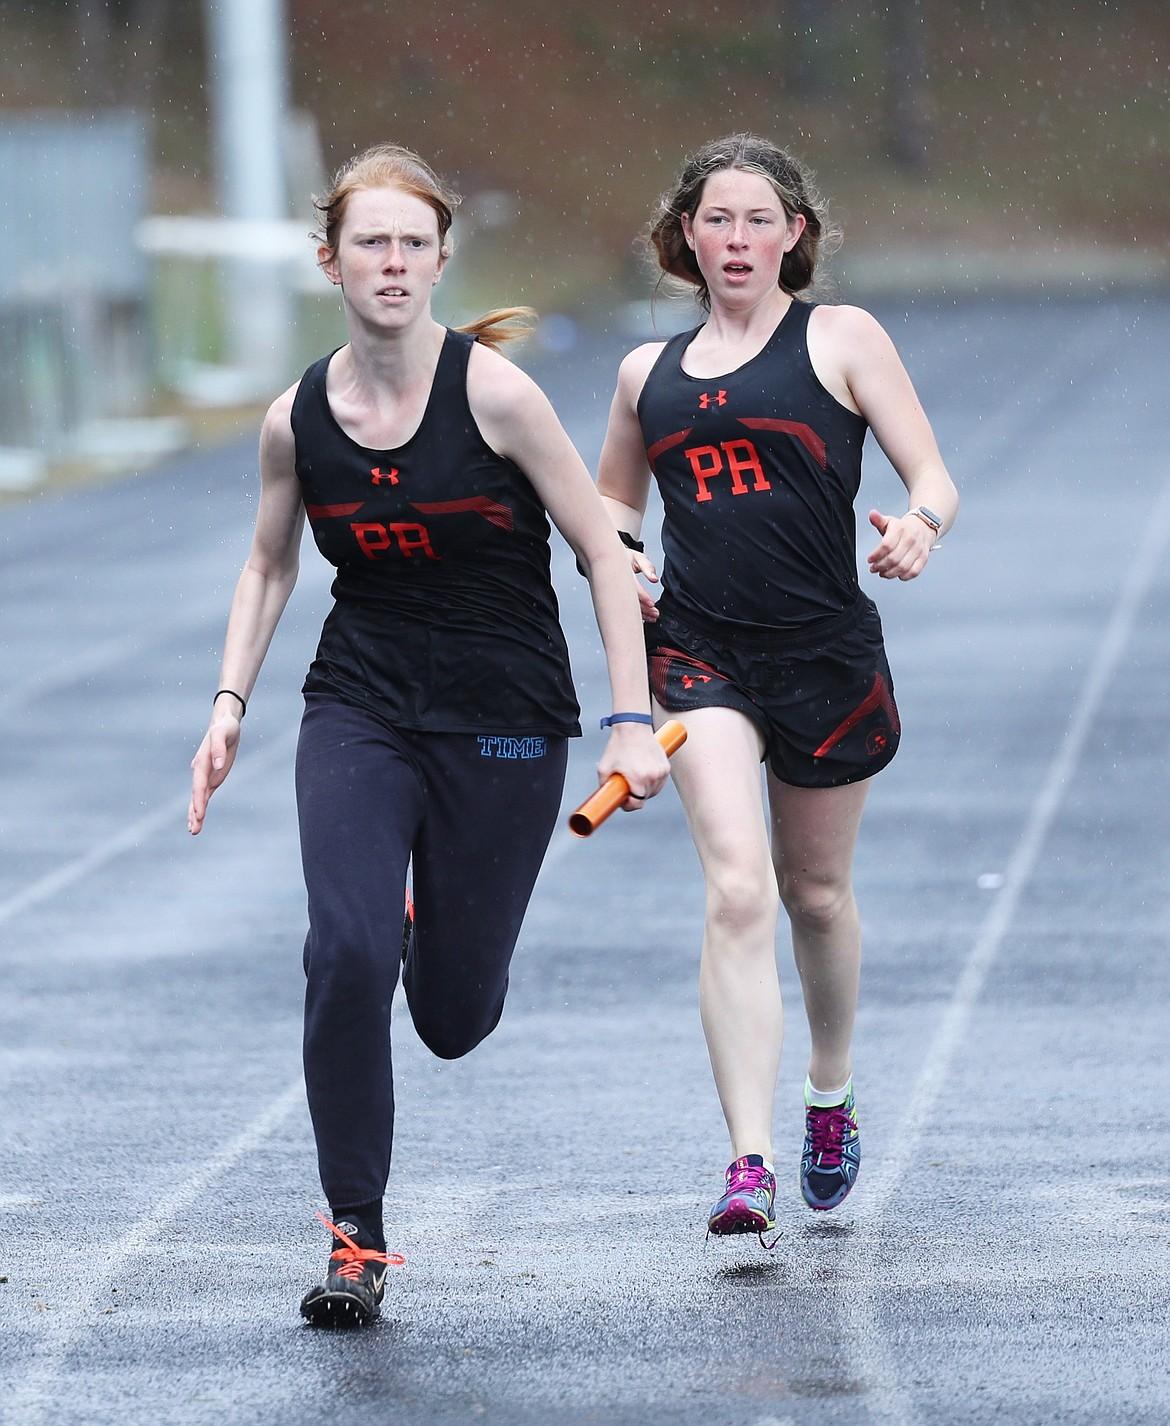 Erika Swoboda (left) receives the baton from Annika Rantala in the sprint medley.